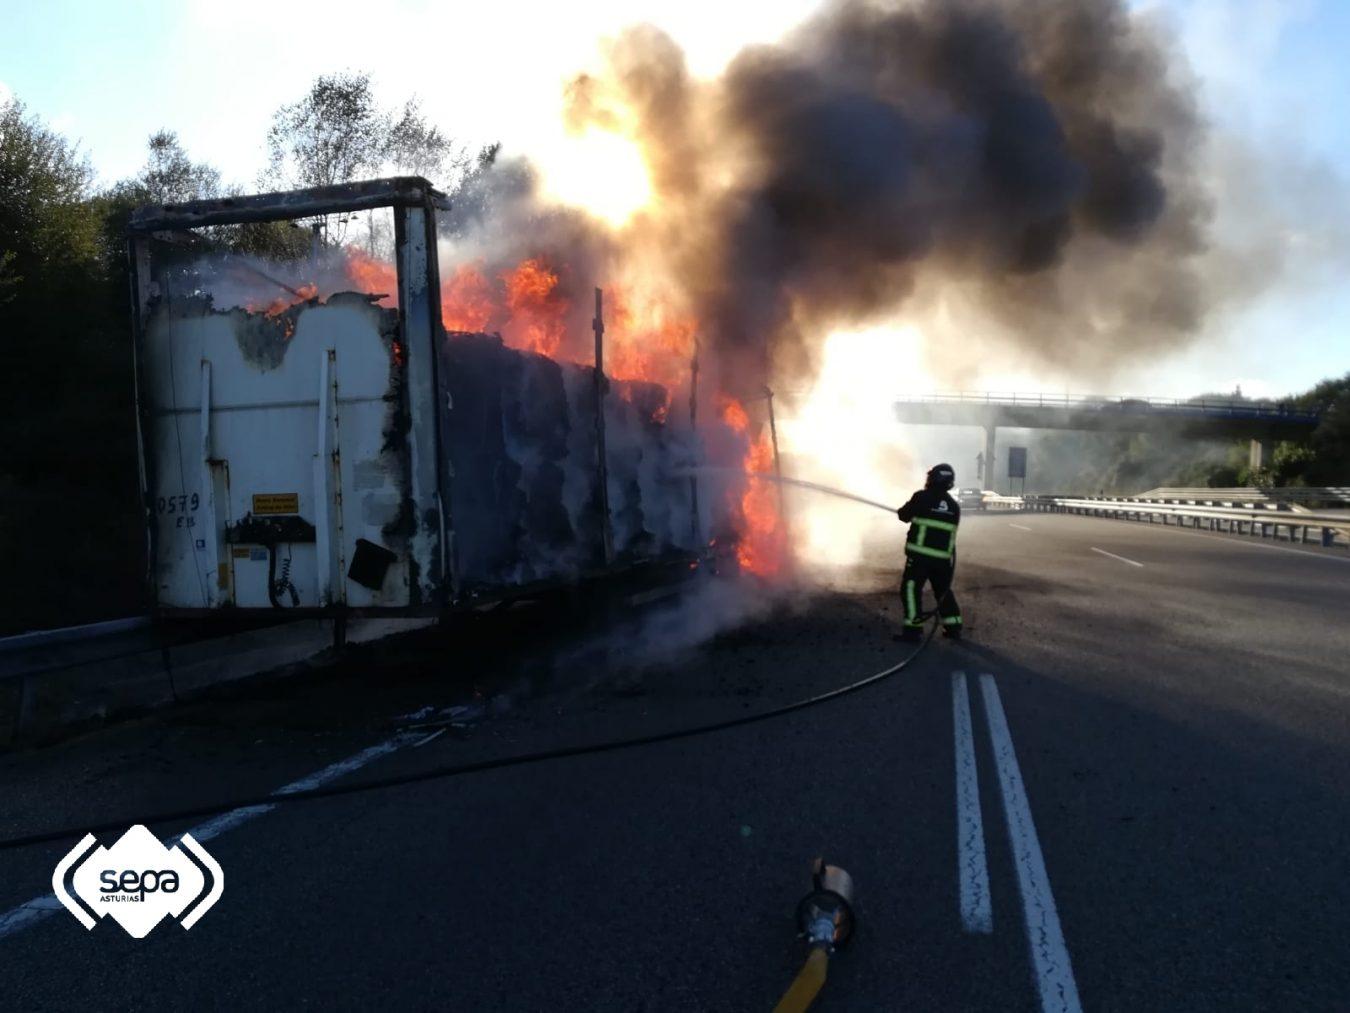 Espectacular incendio de un camión en la A-8 a la altura de Lastres-Luces